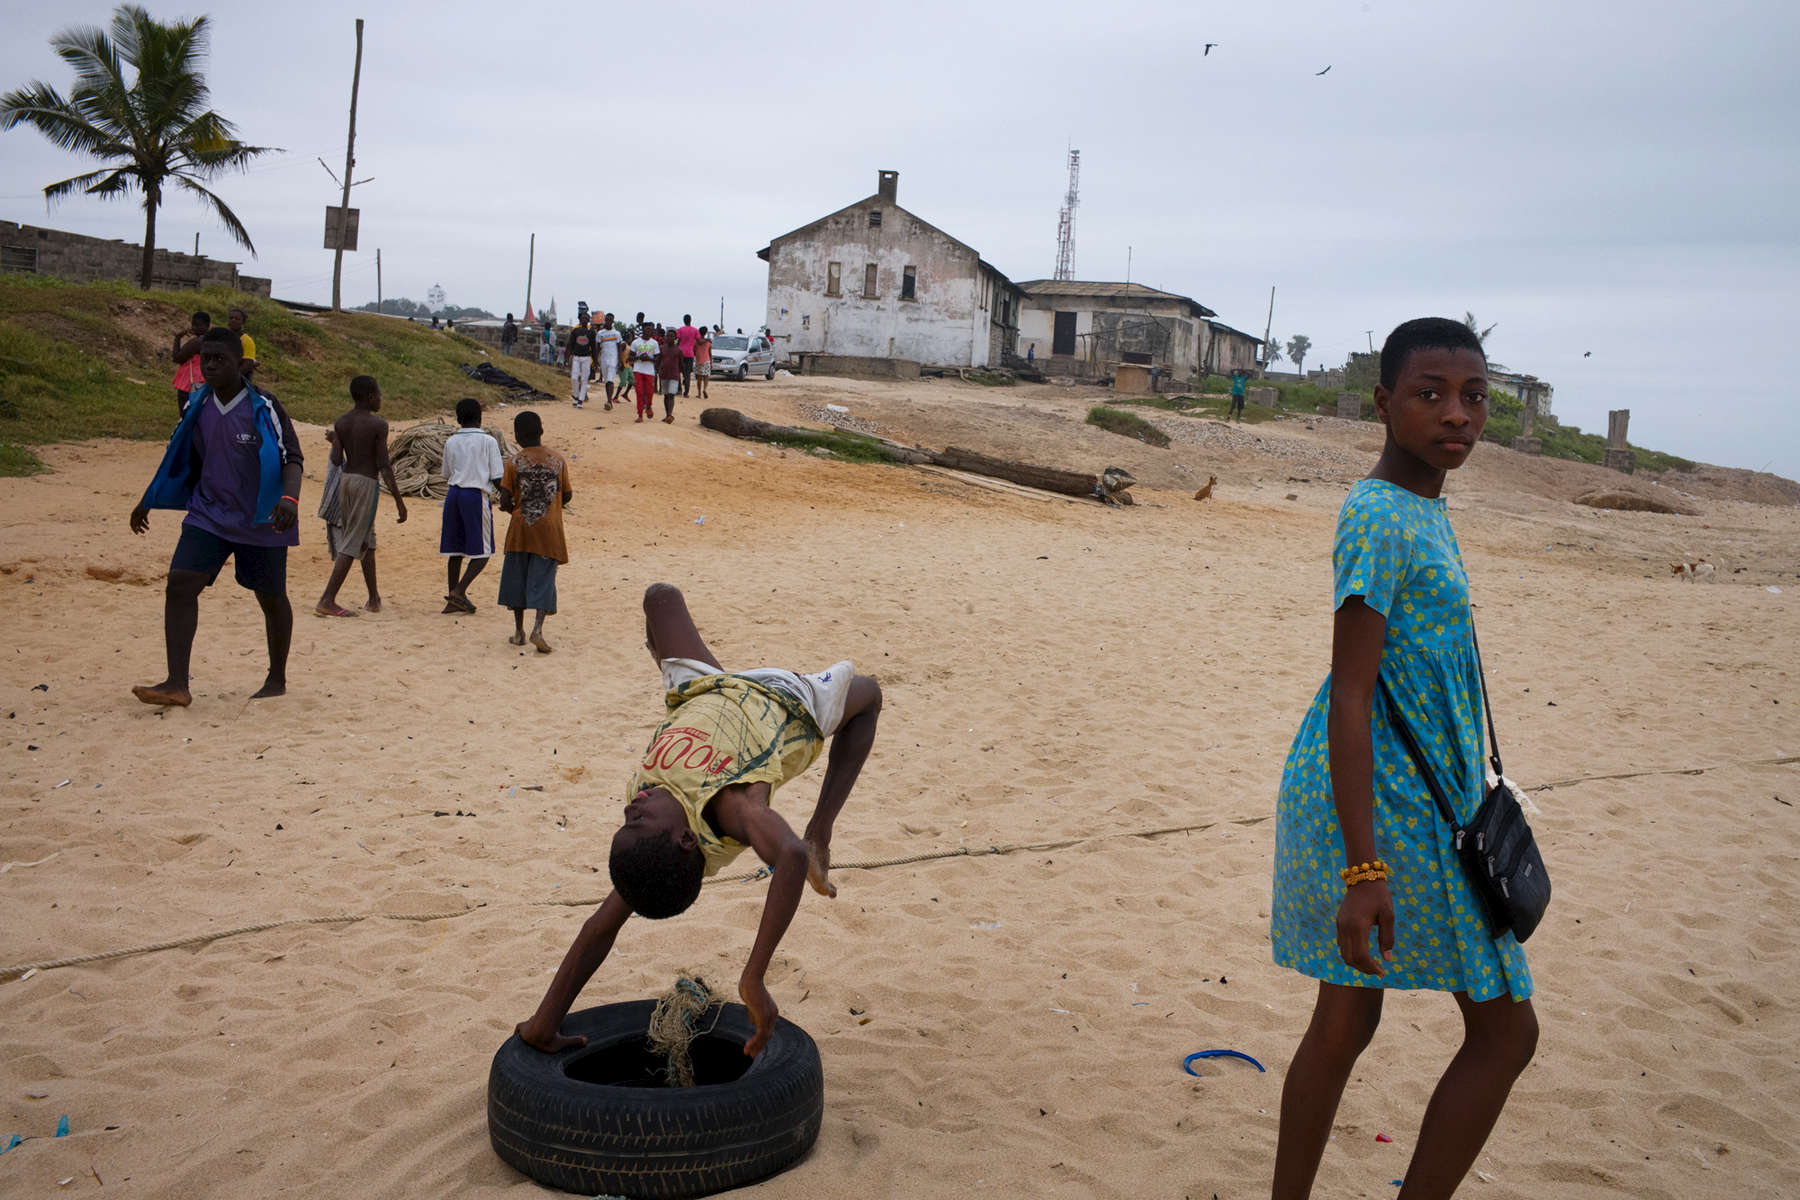 Ghana-day-2-17